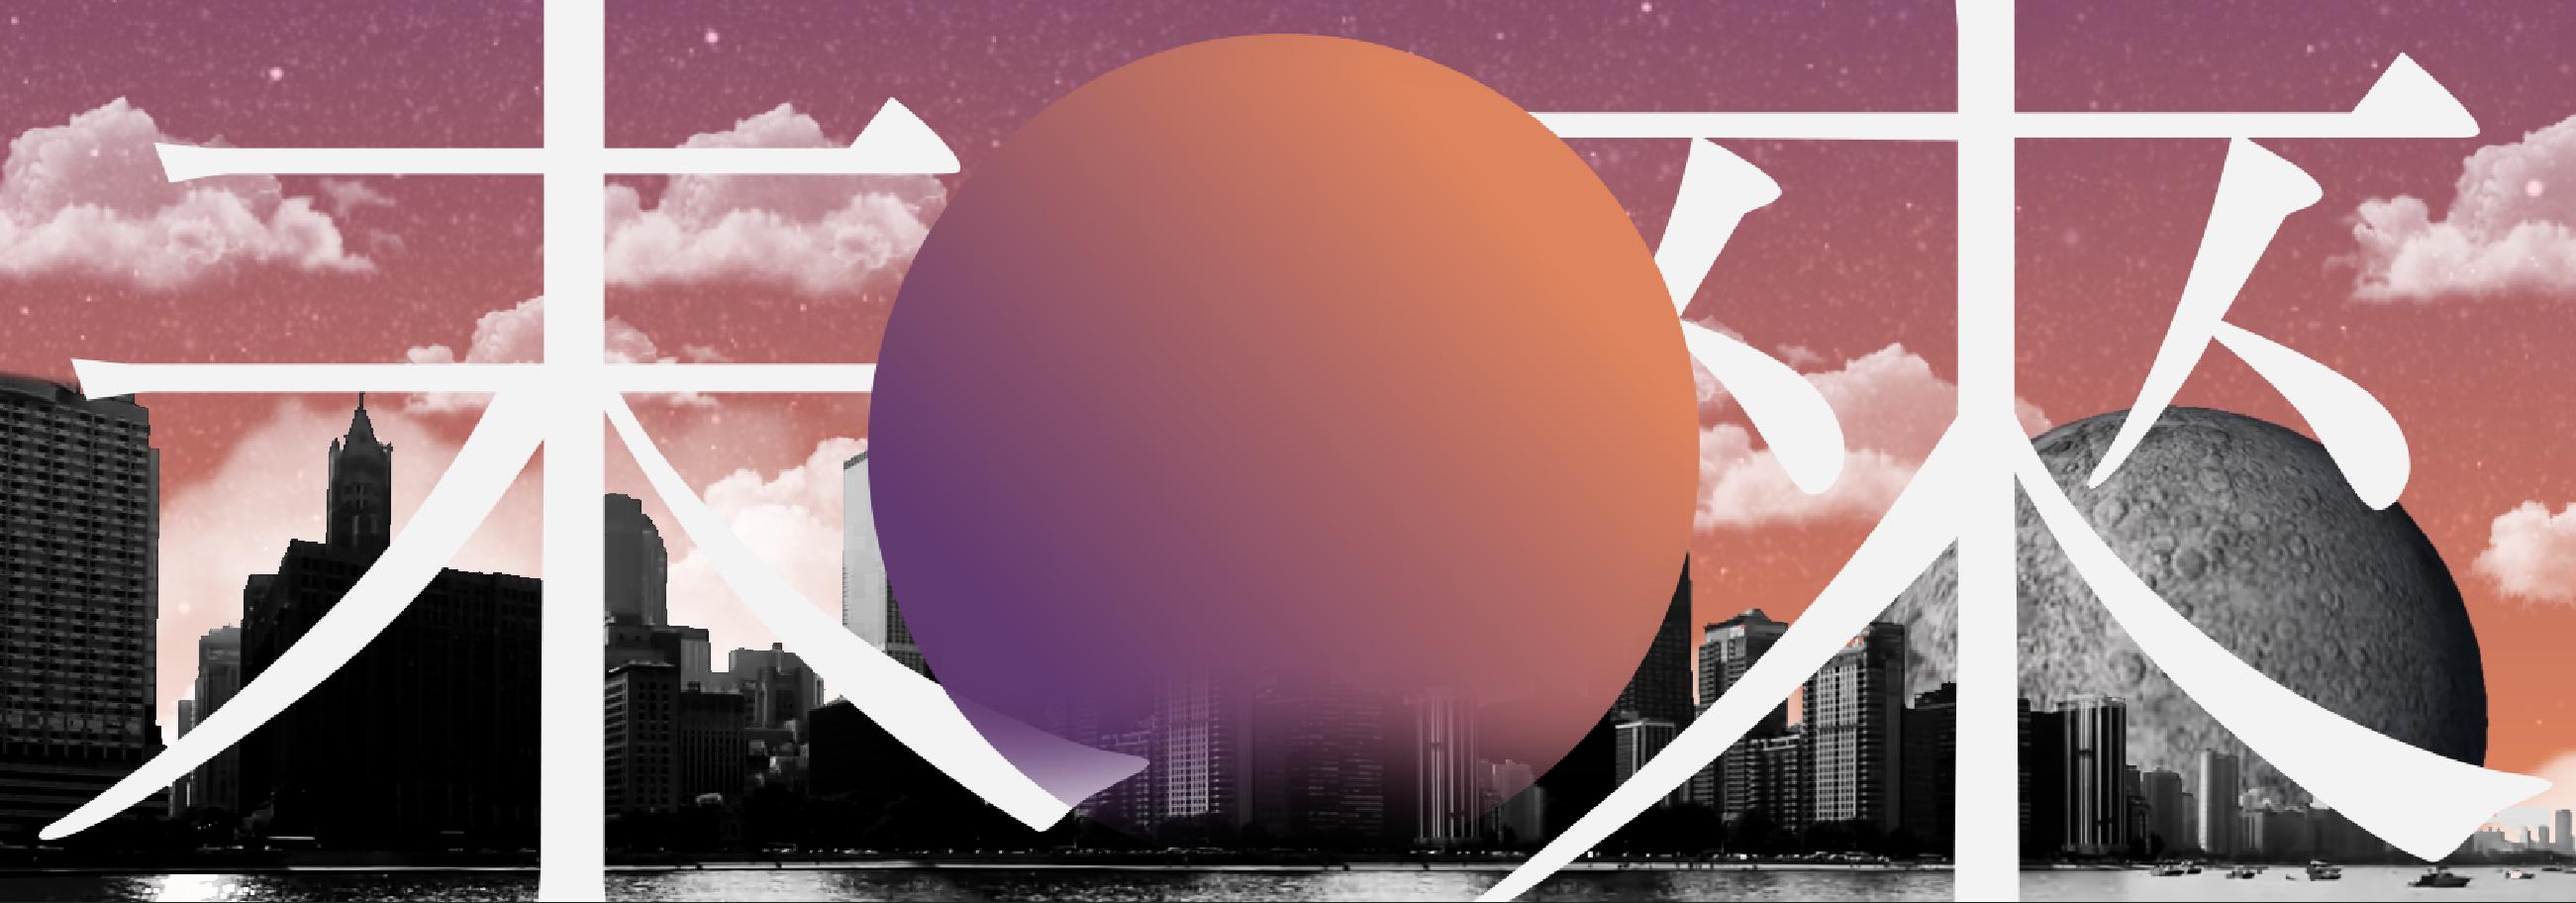 RNK_sunset_3